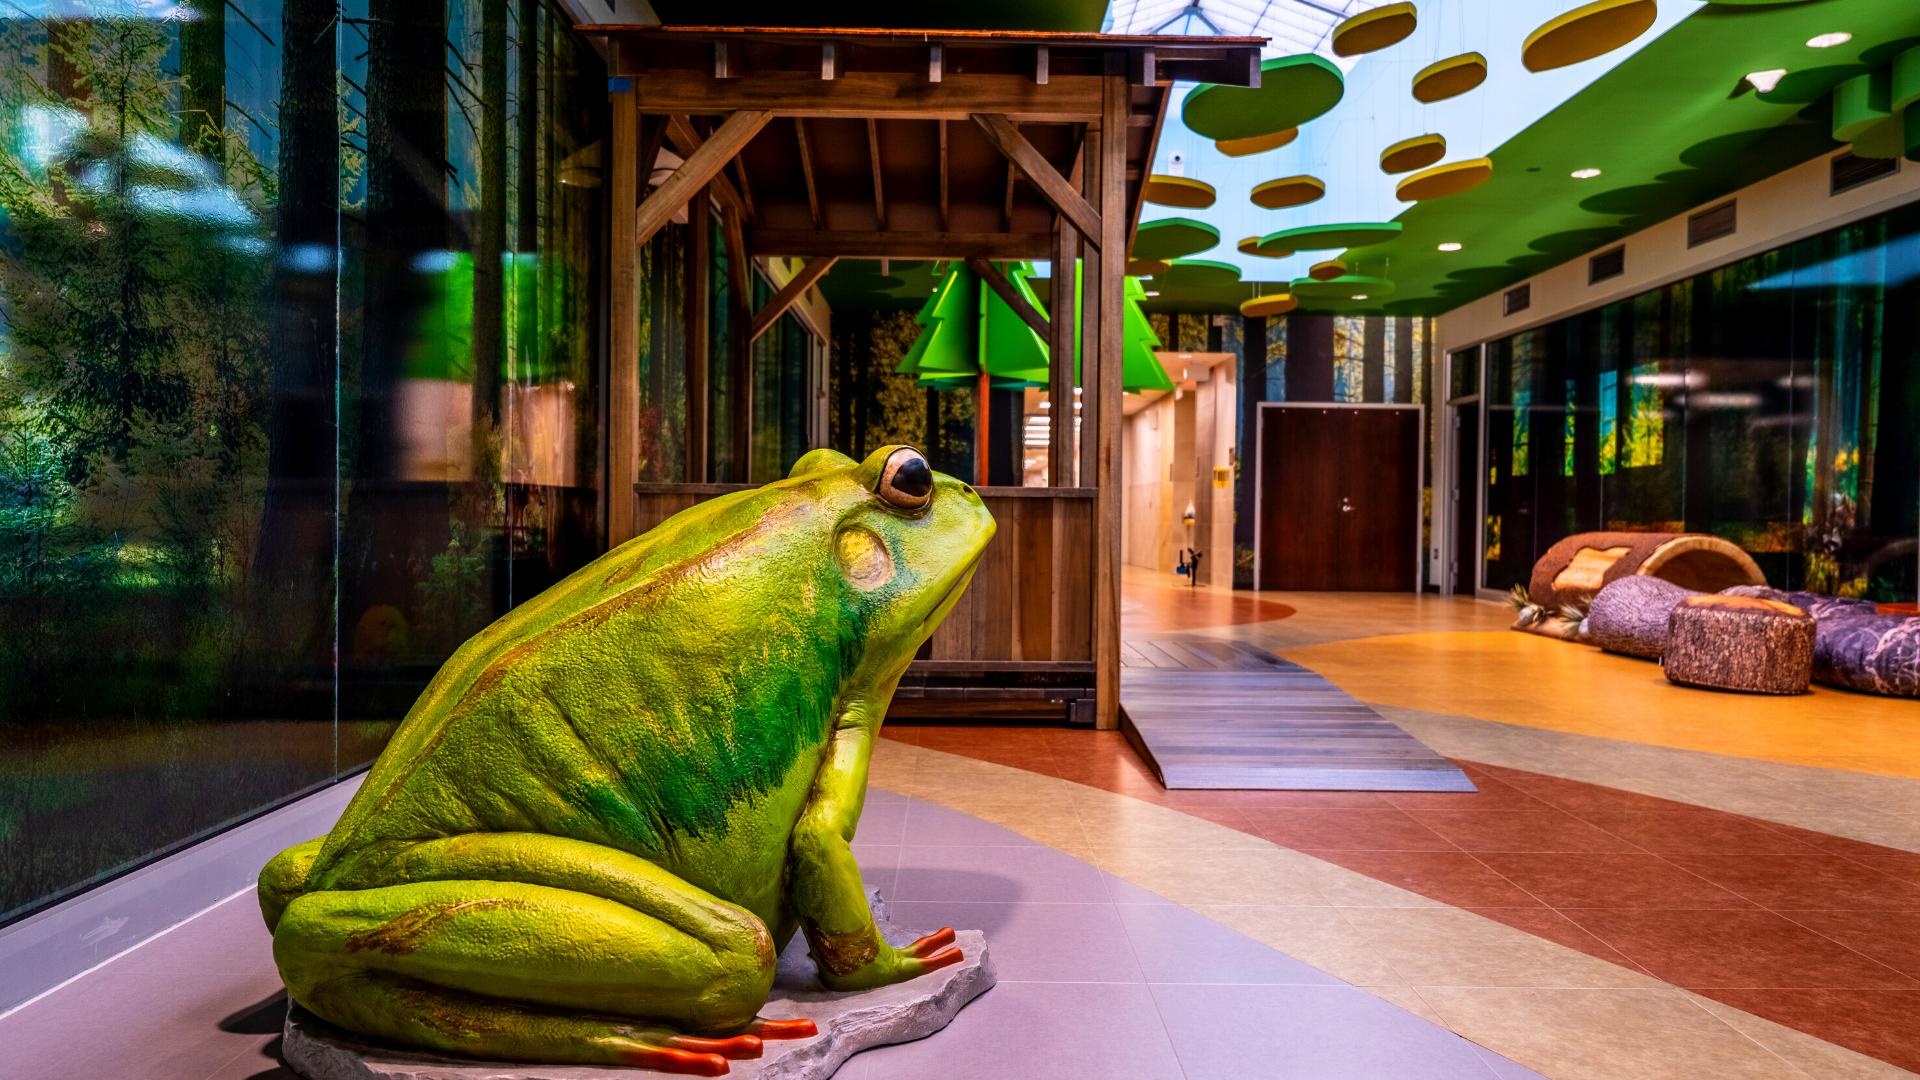 Fun frog room